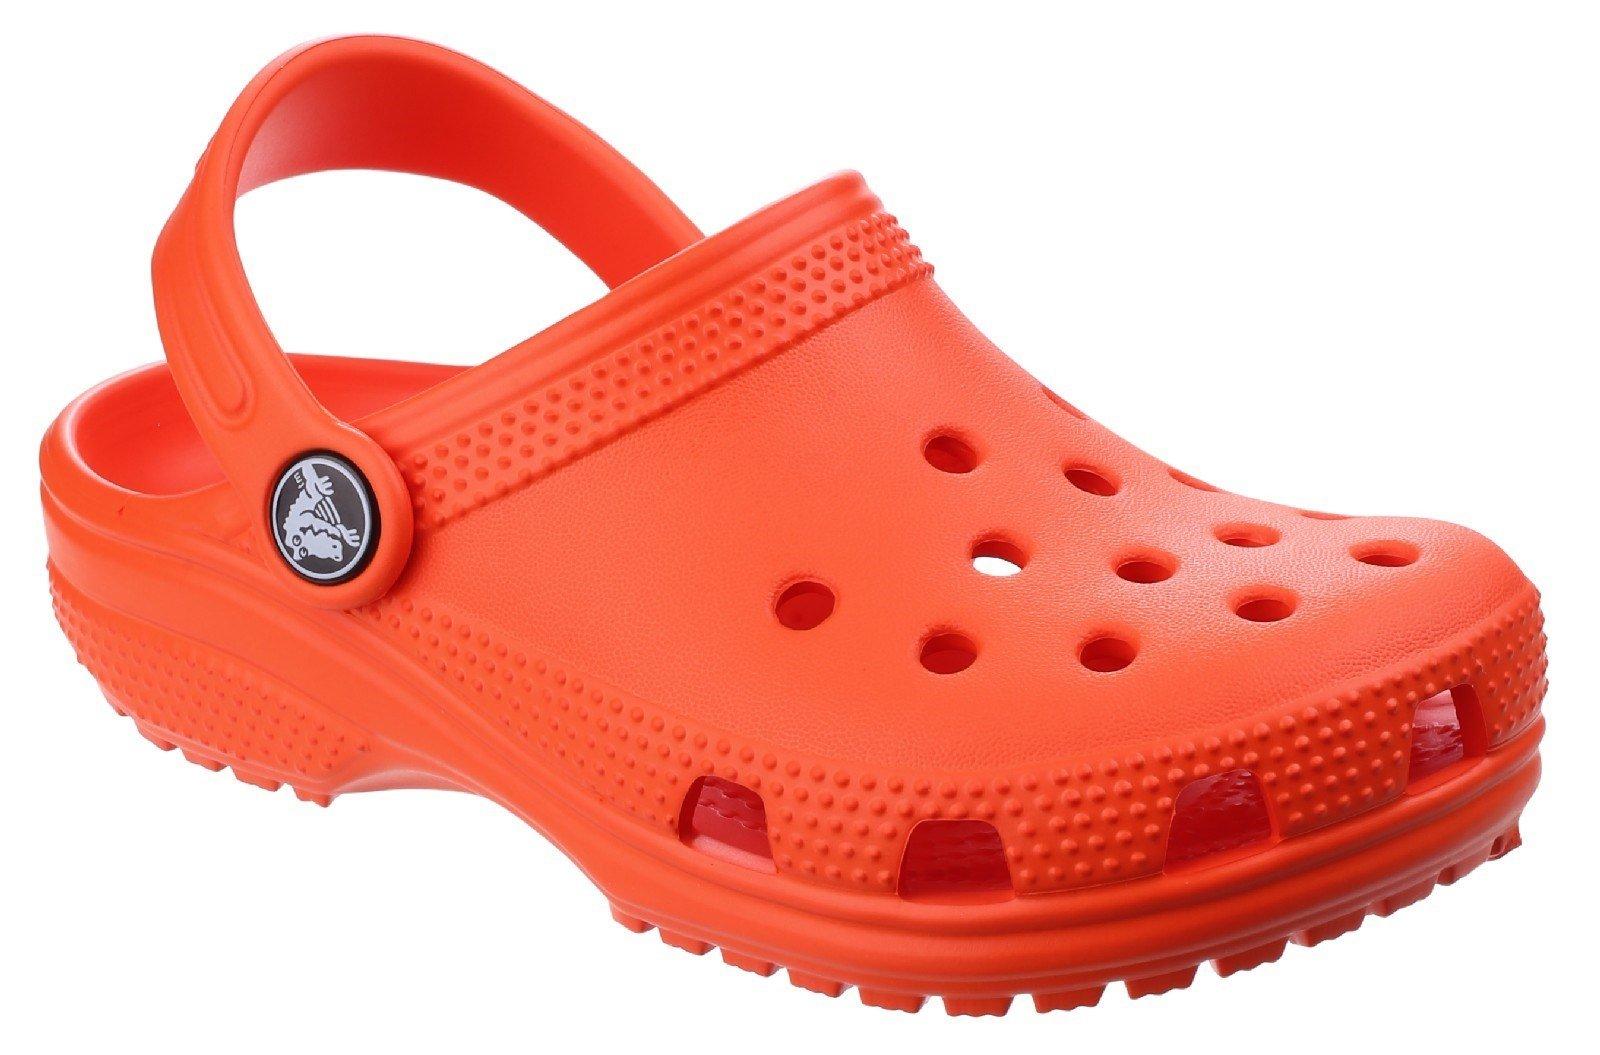 Crocs Kid's Classic Clog Slip On Sandal Various Colours 25239 - Tangerine 4 UK